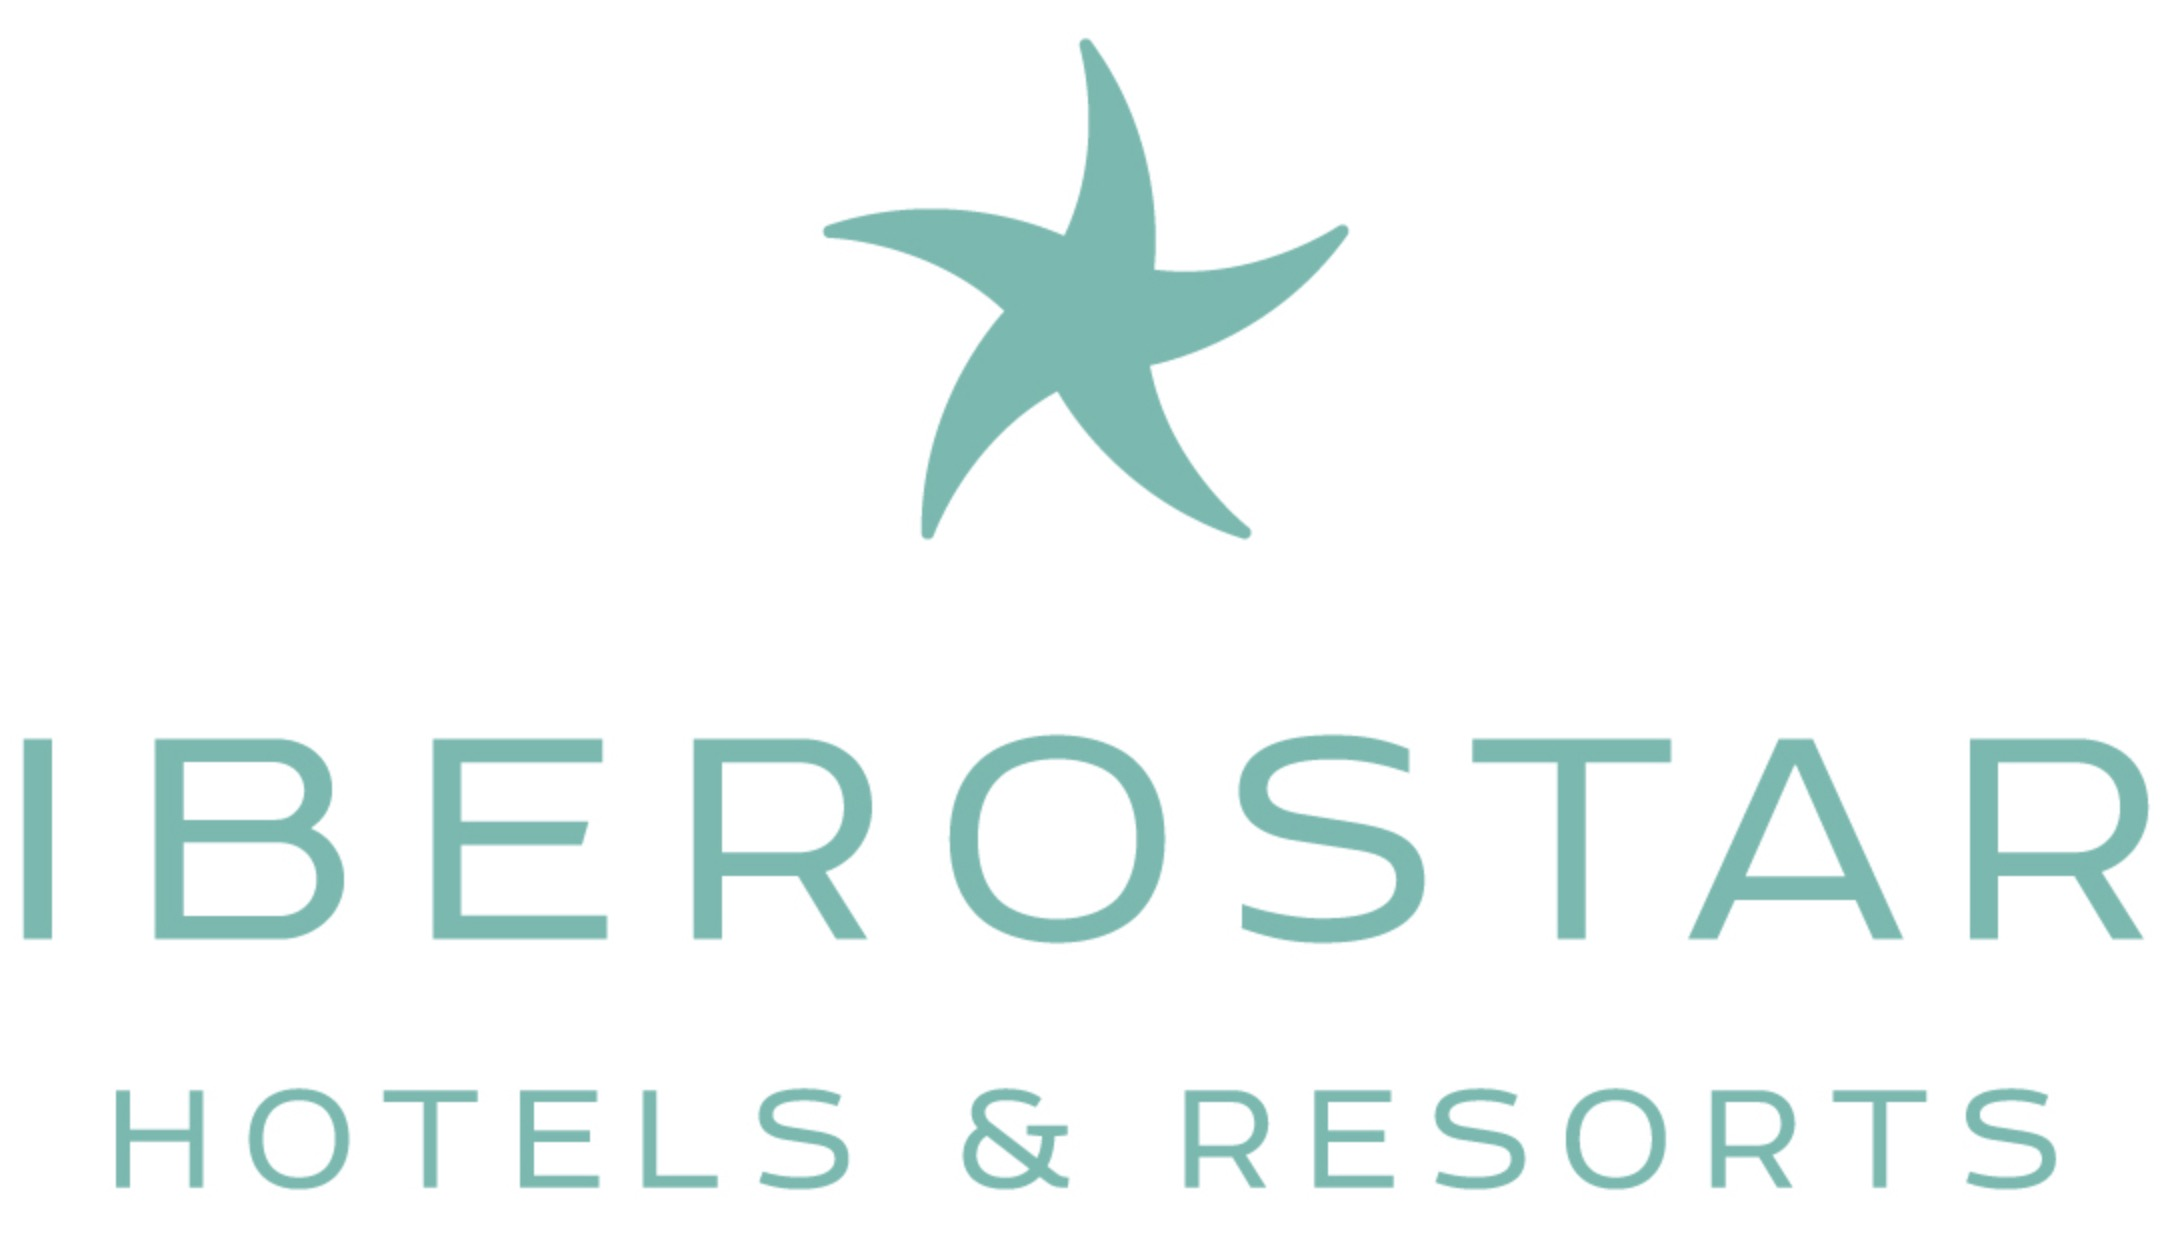 Code promo Iberostar : Jusqu'à 15% de réduction